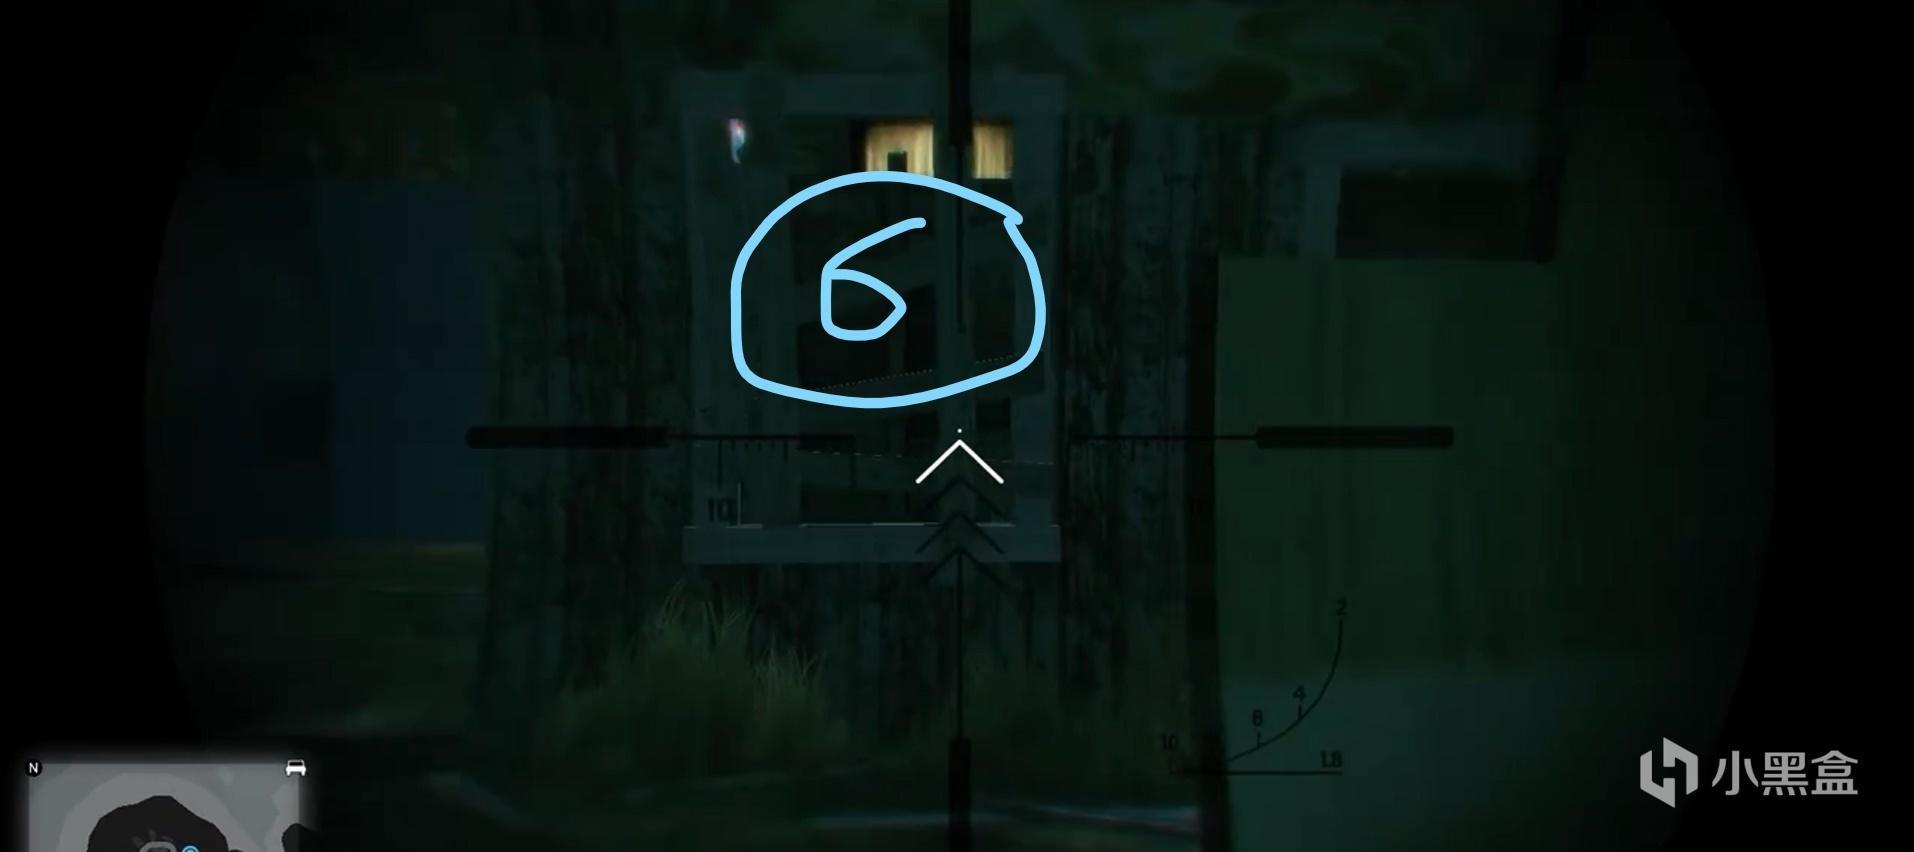 GTA5 首轮募资教程插图25